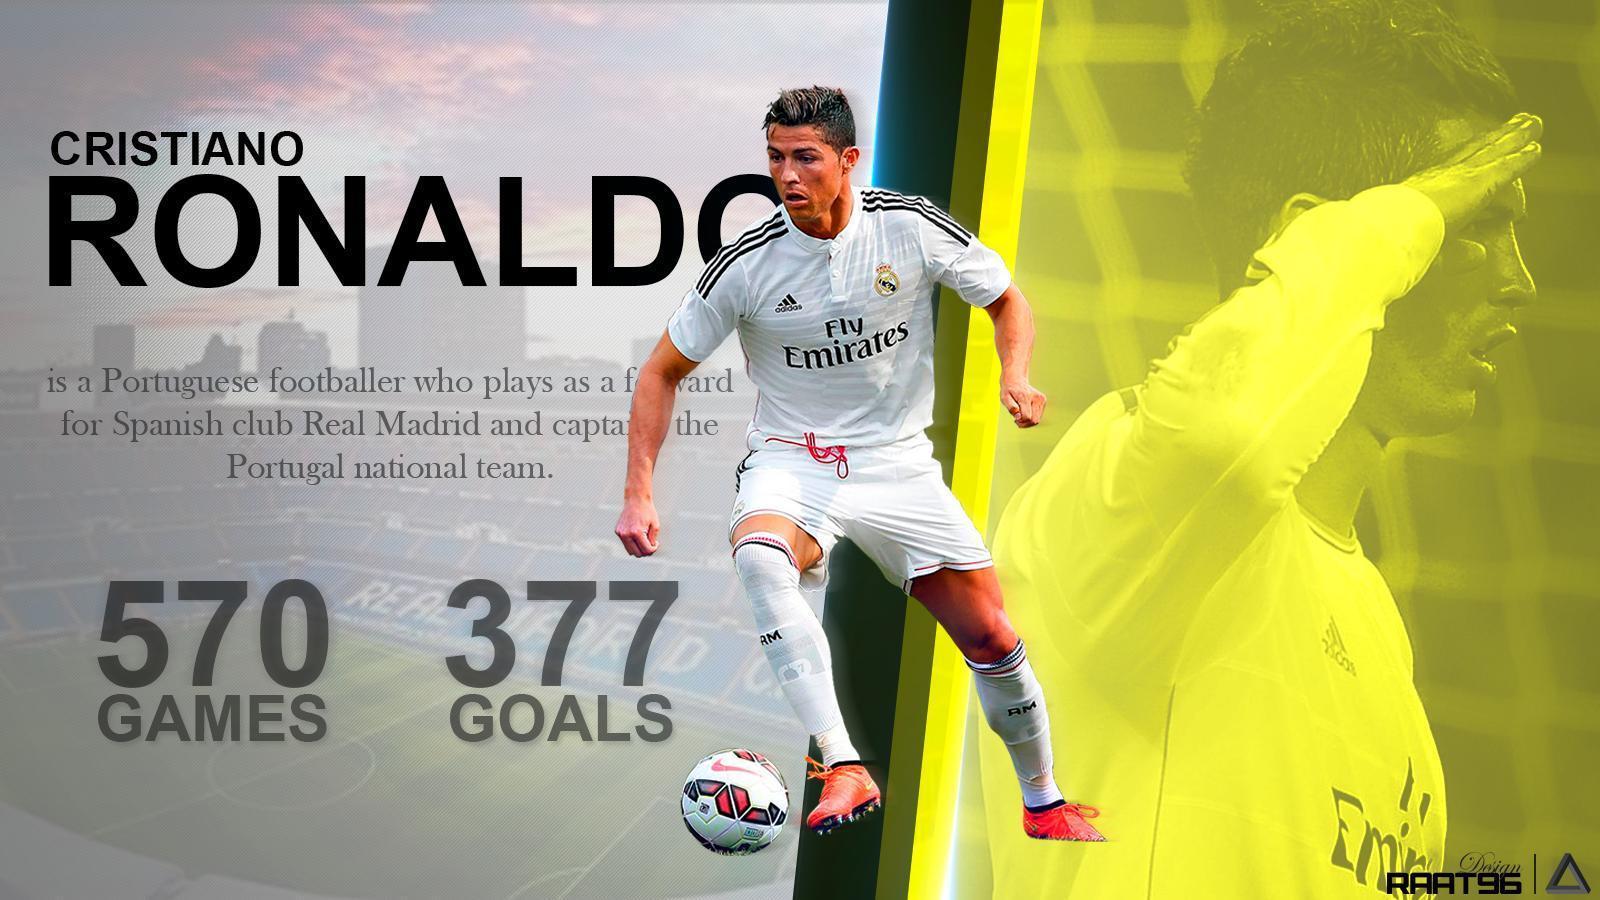 Cristiano Ronaldo Wallpapers 2015 1600x900